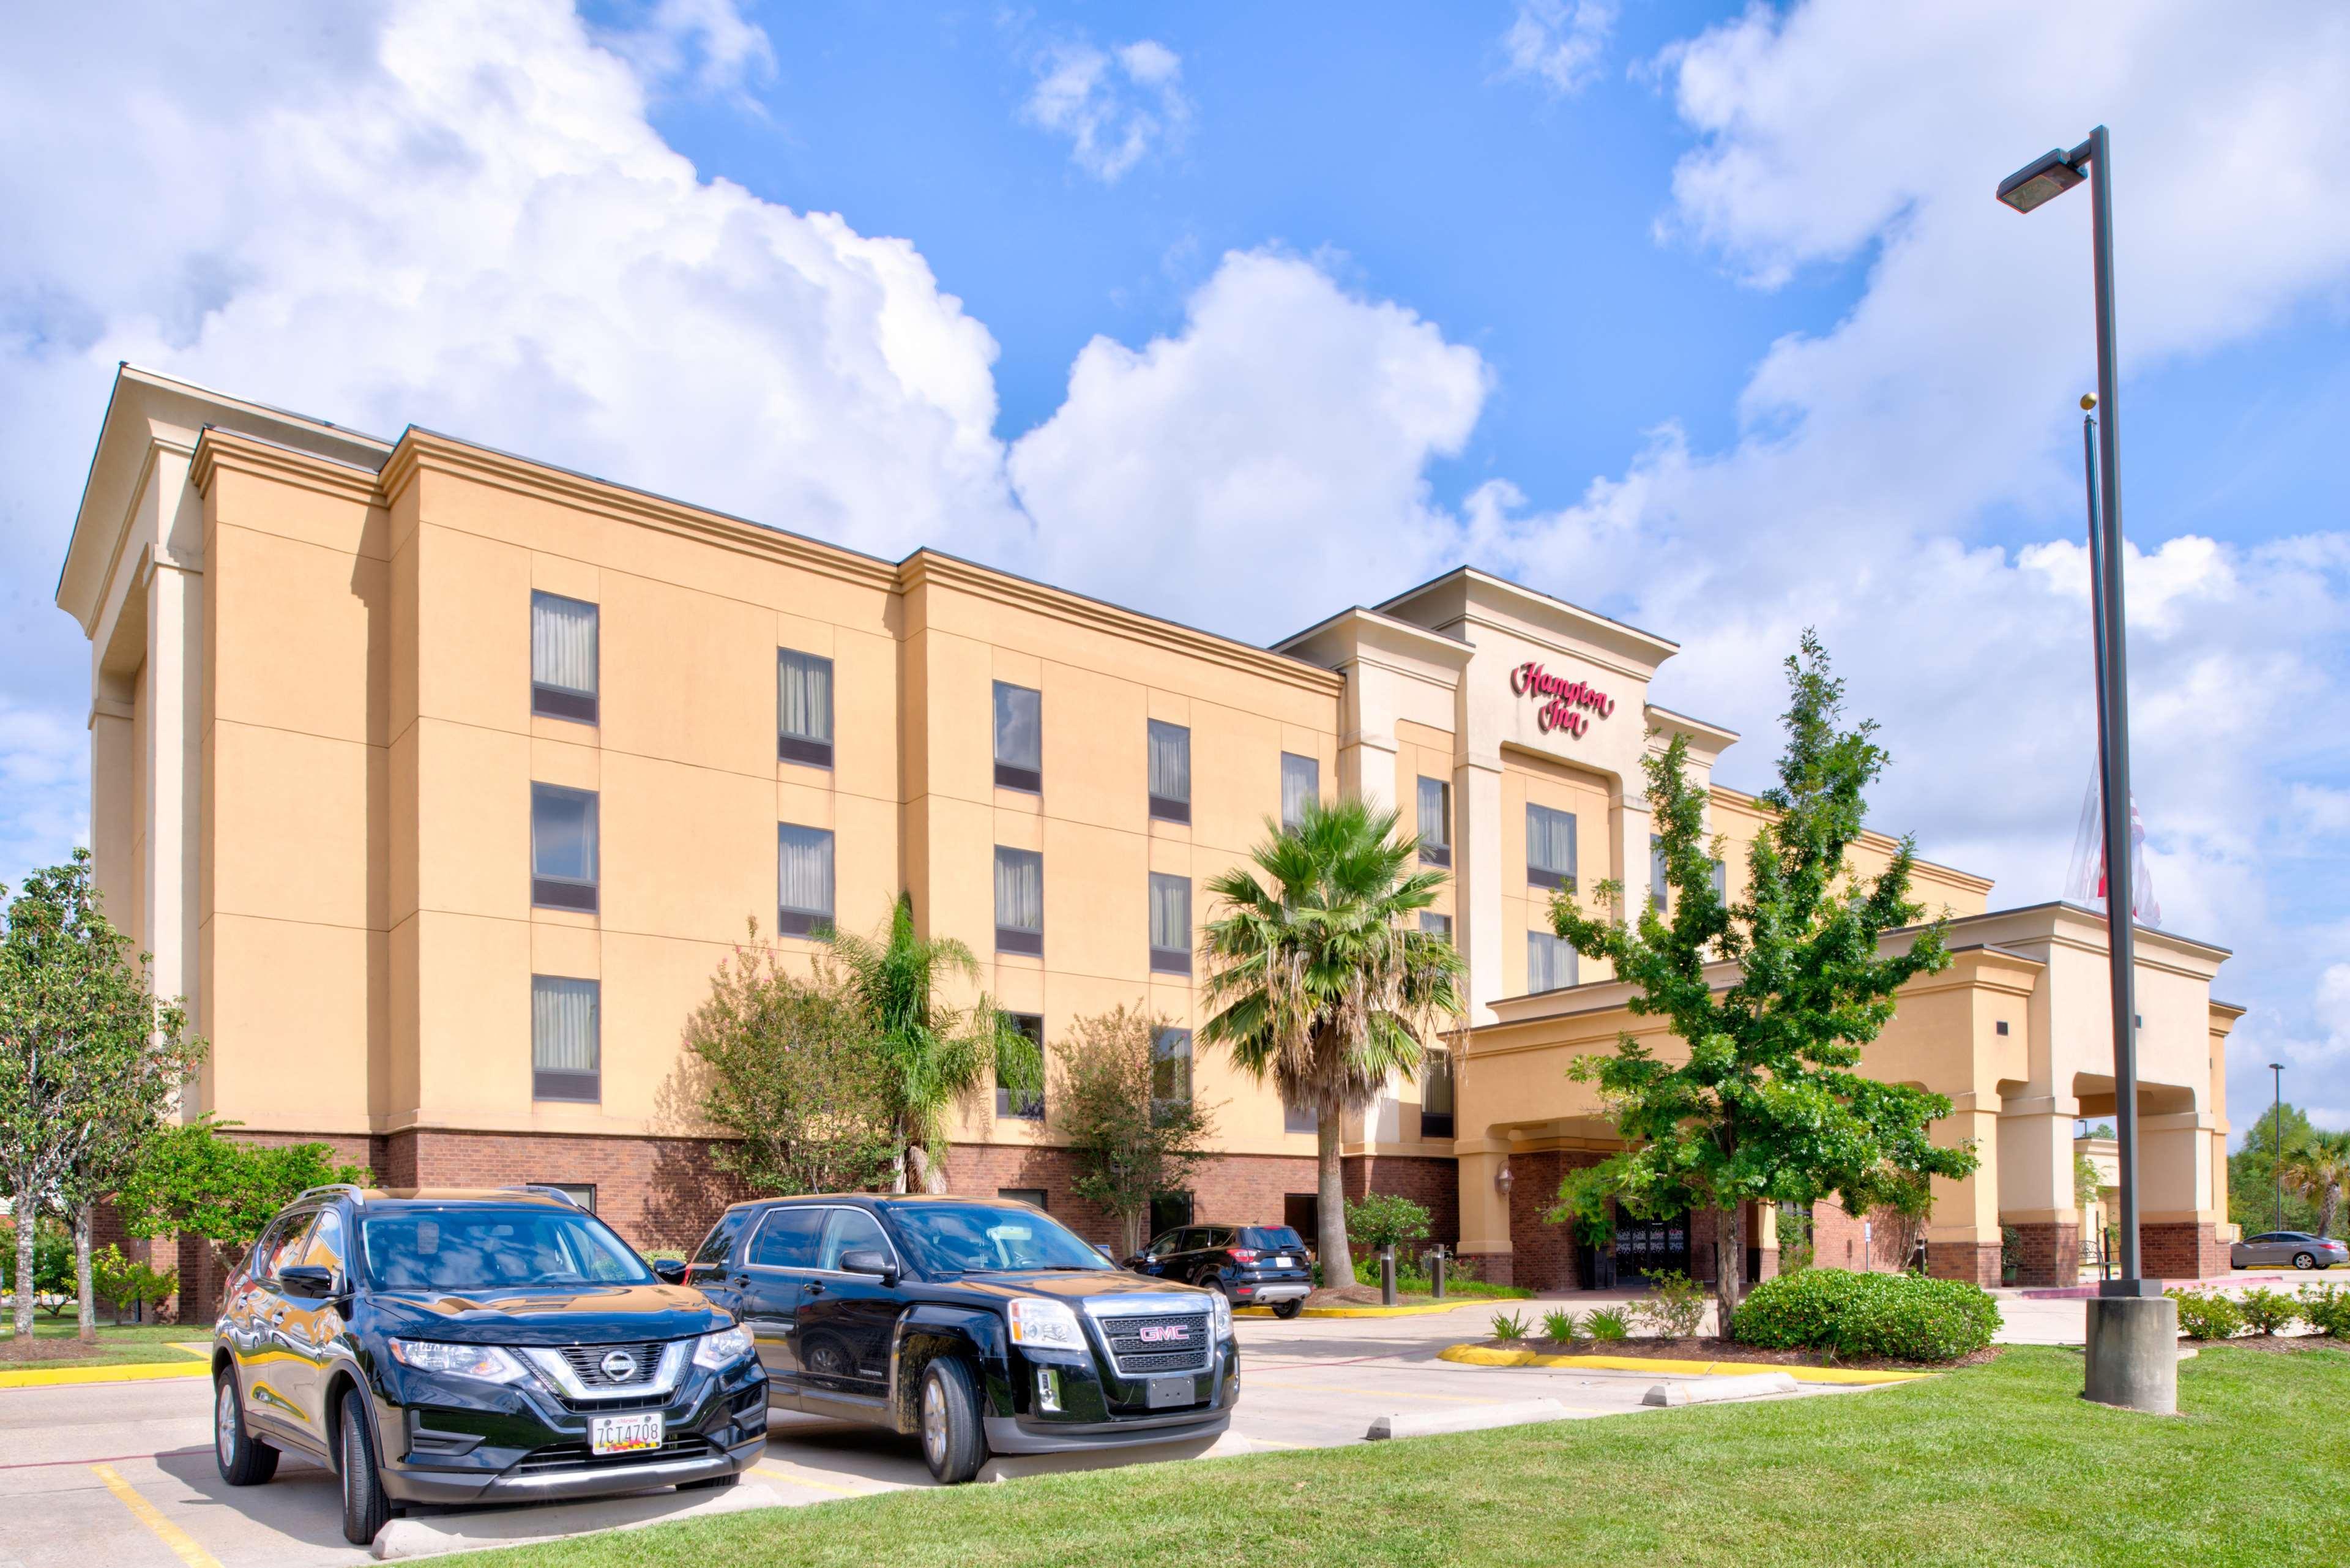 Hampton Inn Baton Rouge - Denham Springs image 1